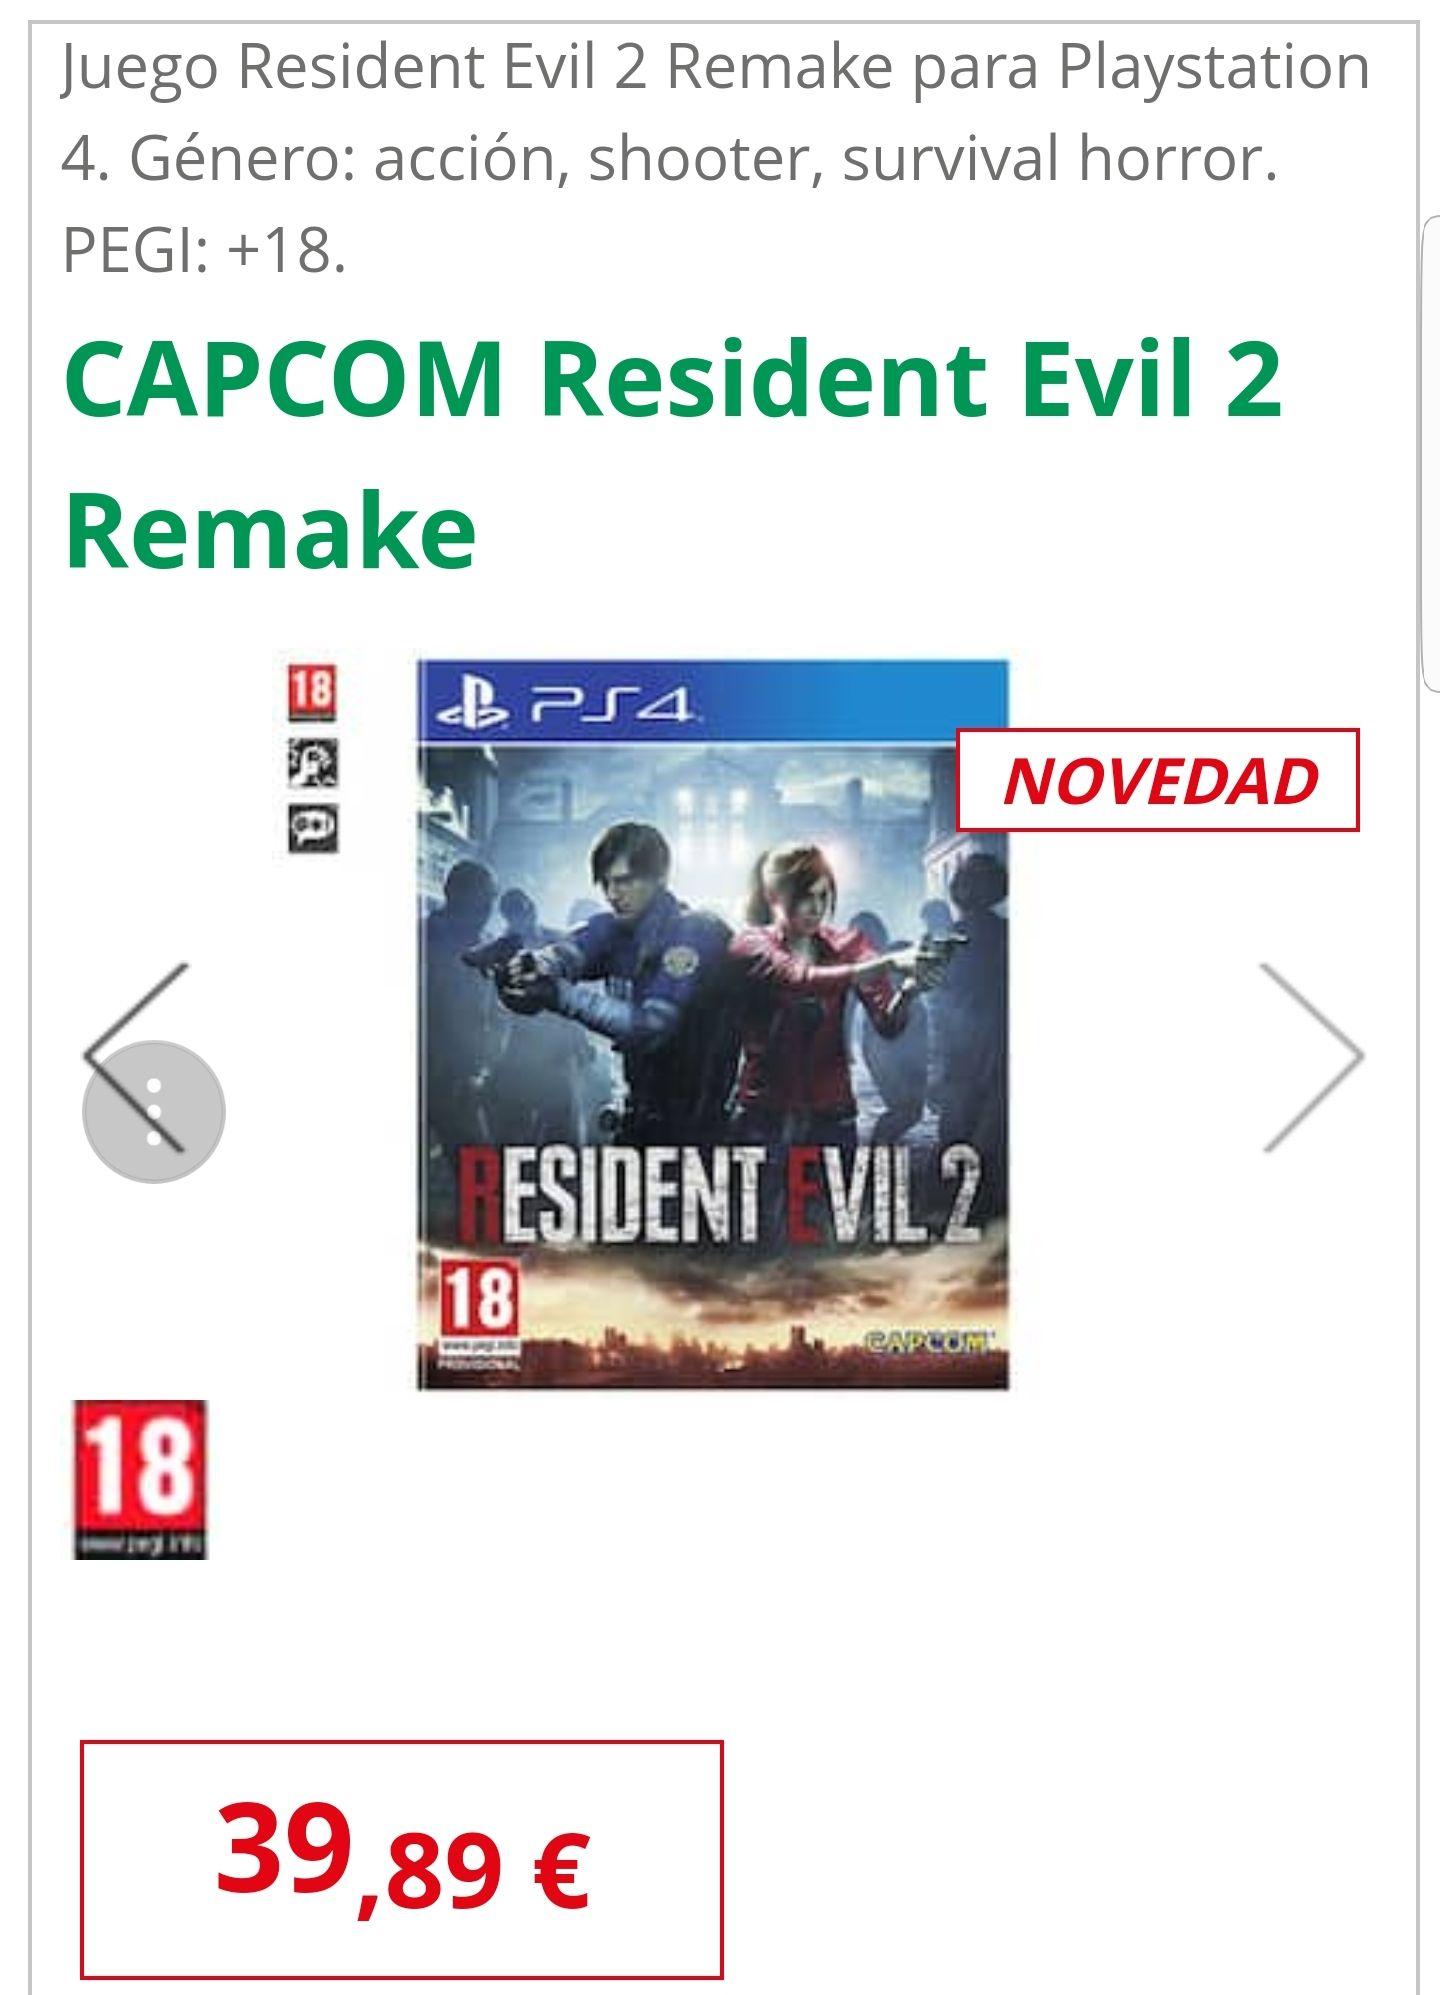 Juego Resident Evil 2 Remake para Playstation